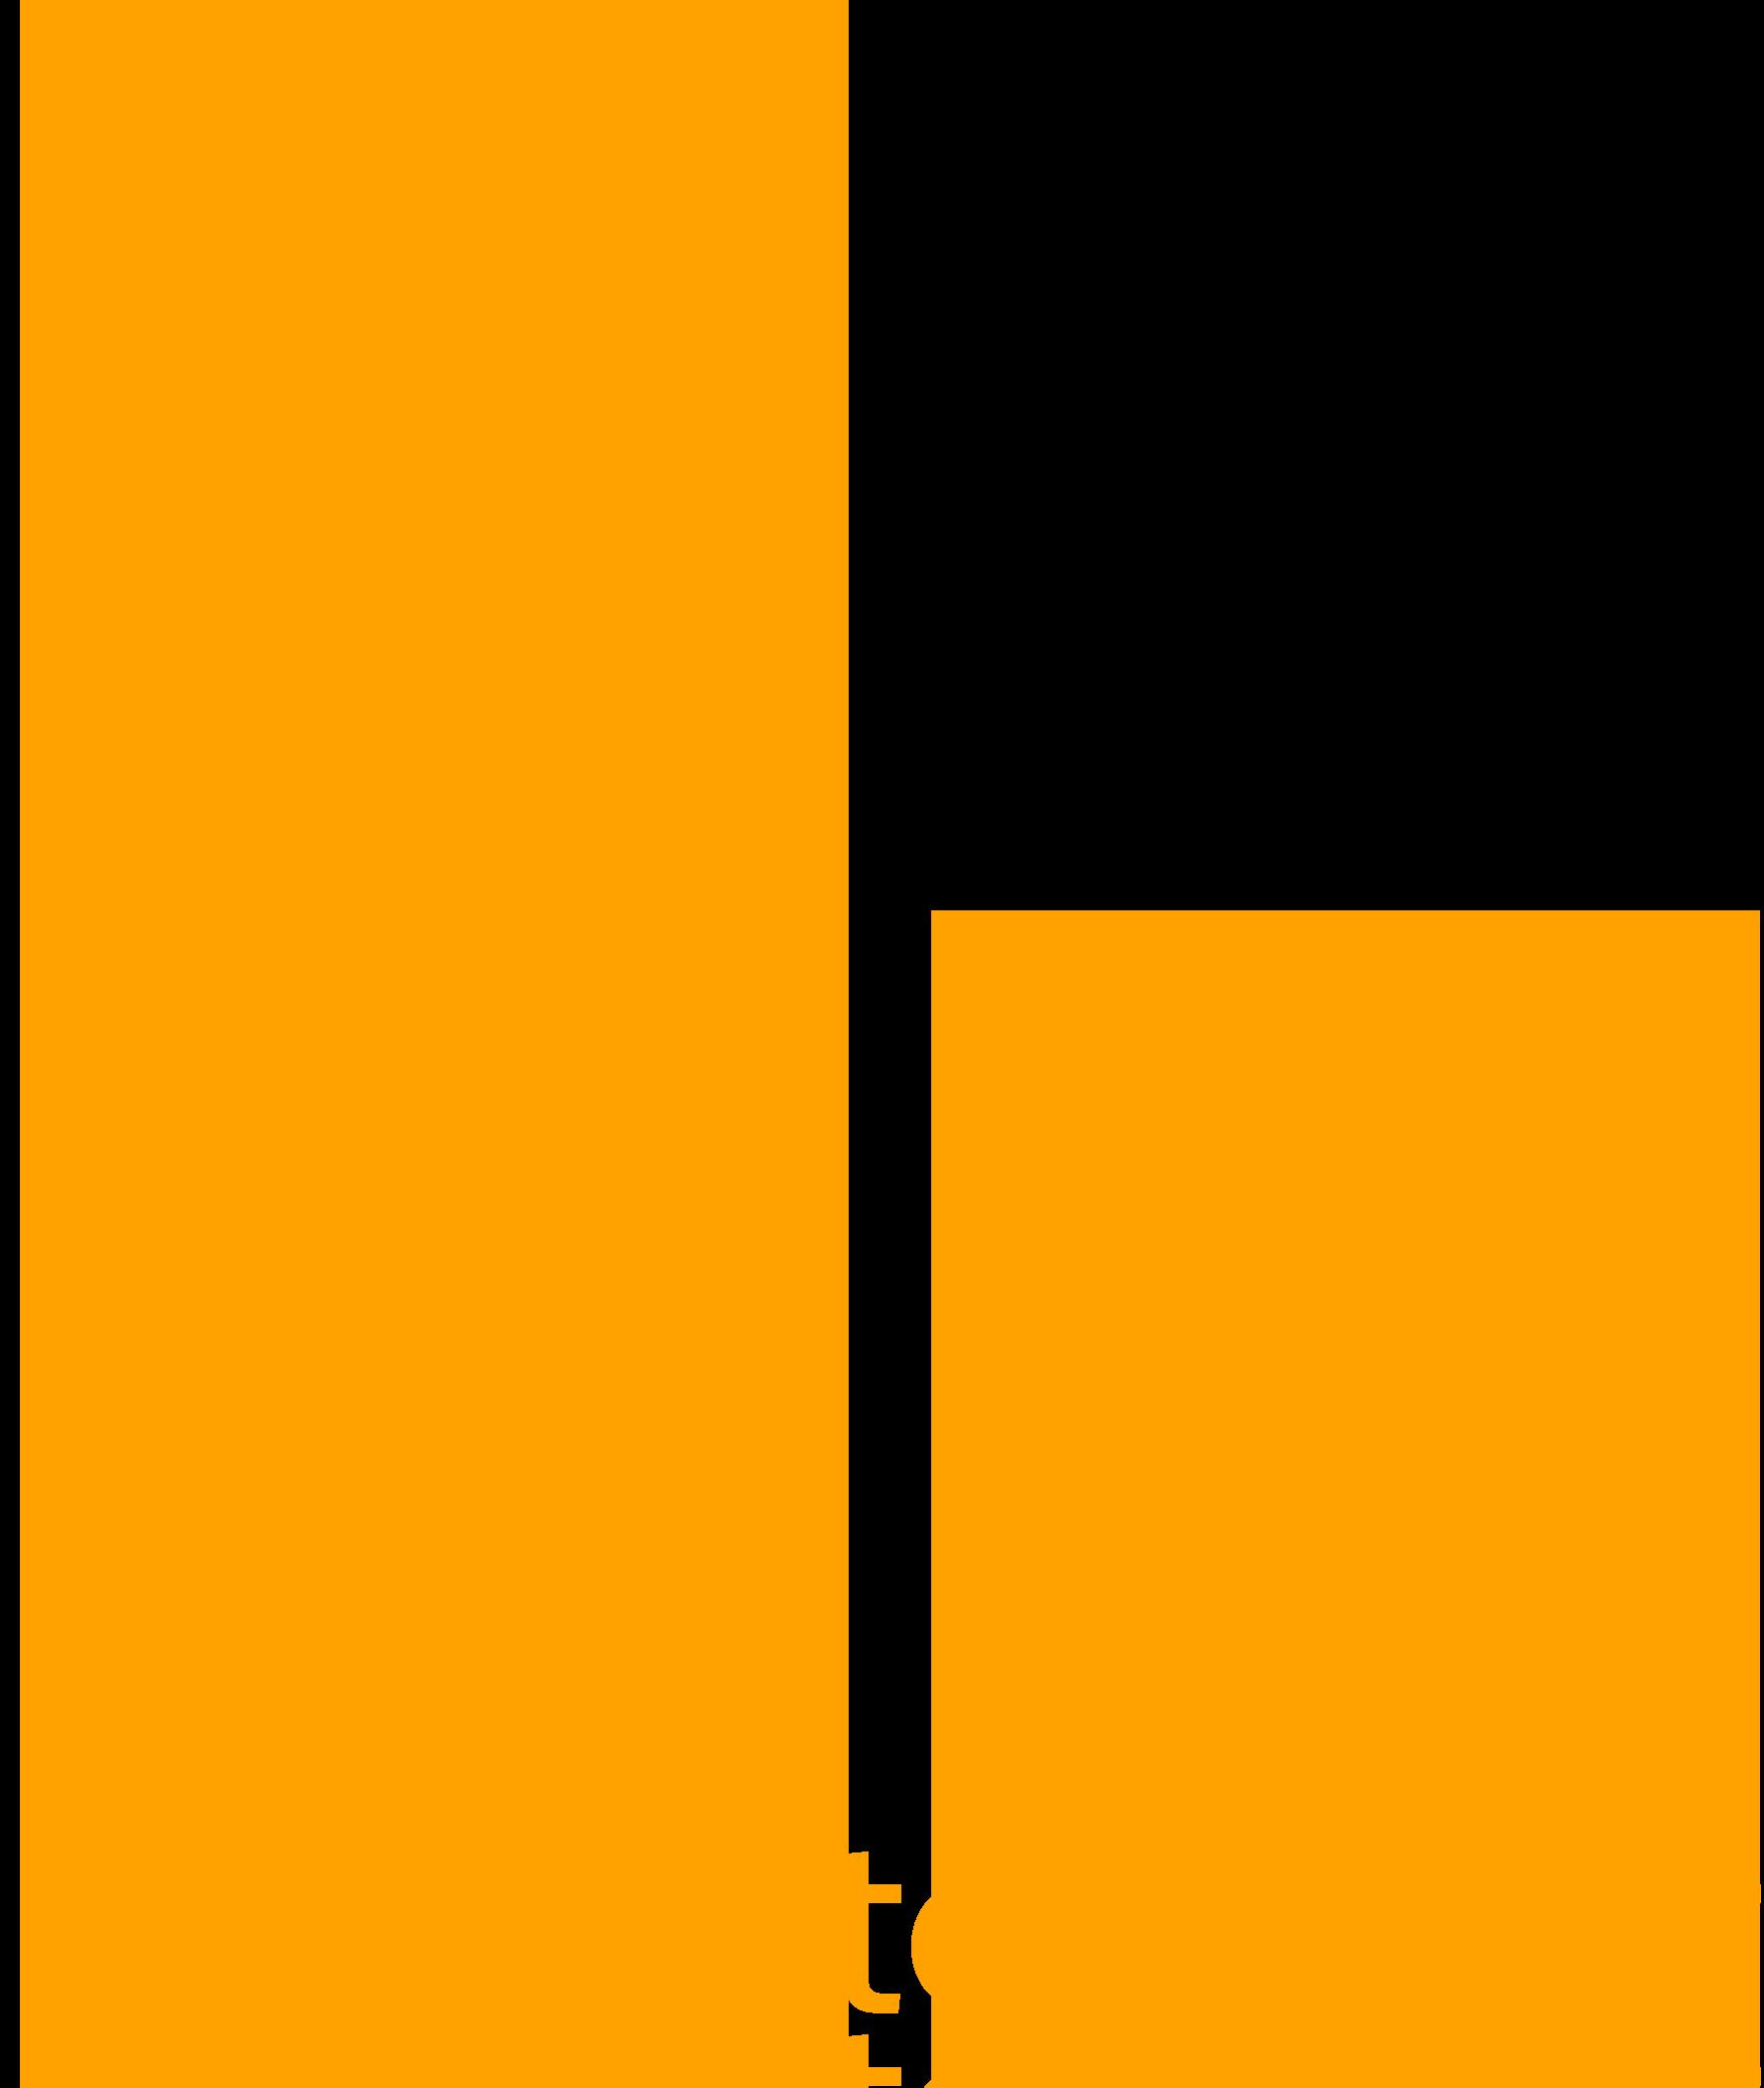 Lehrmaterial.net